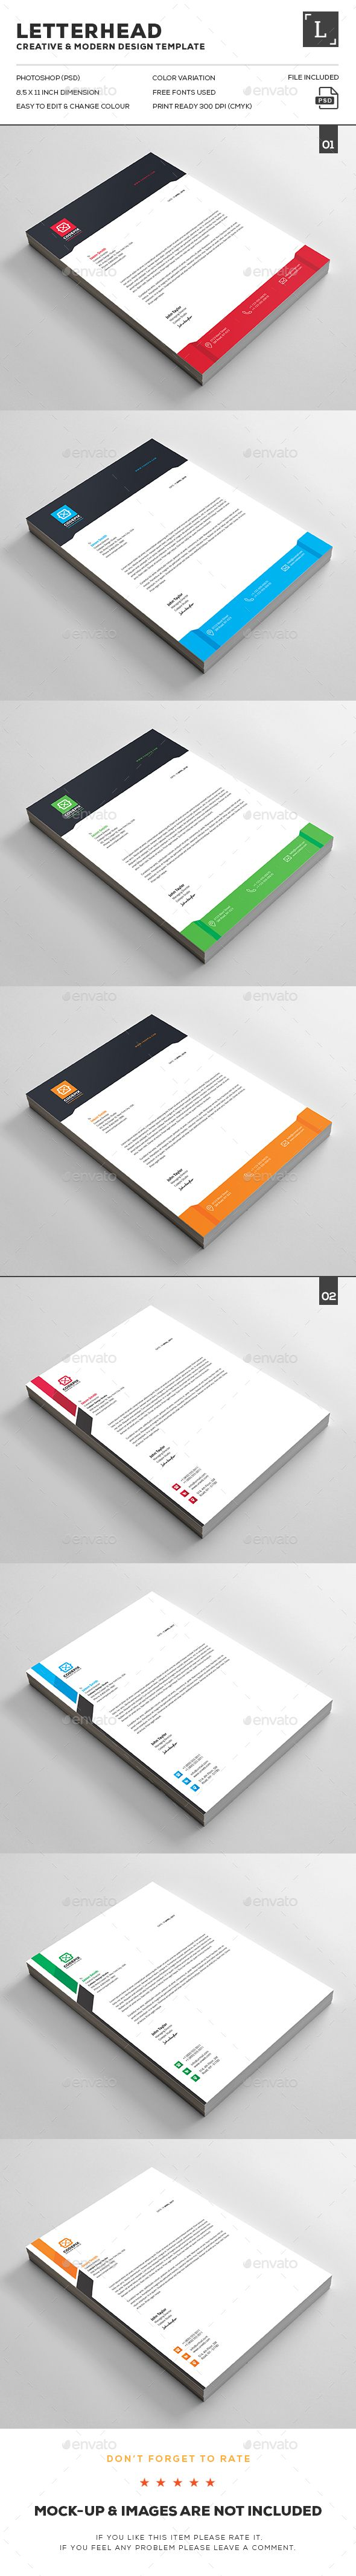 Free Printable Business Letterhead Templates Letterhead Bundle  Pinterest  Stationery Printing Letterhead .